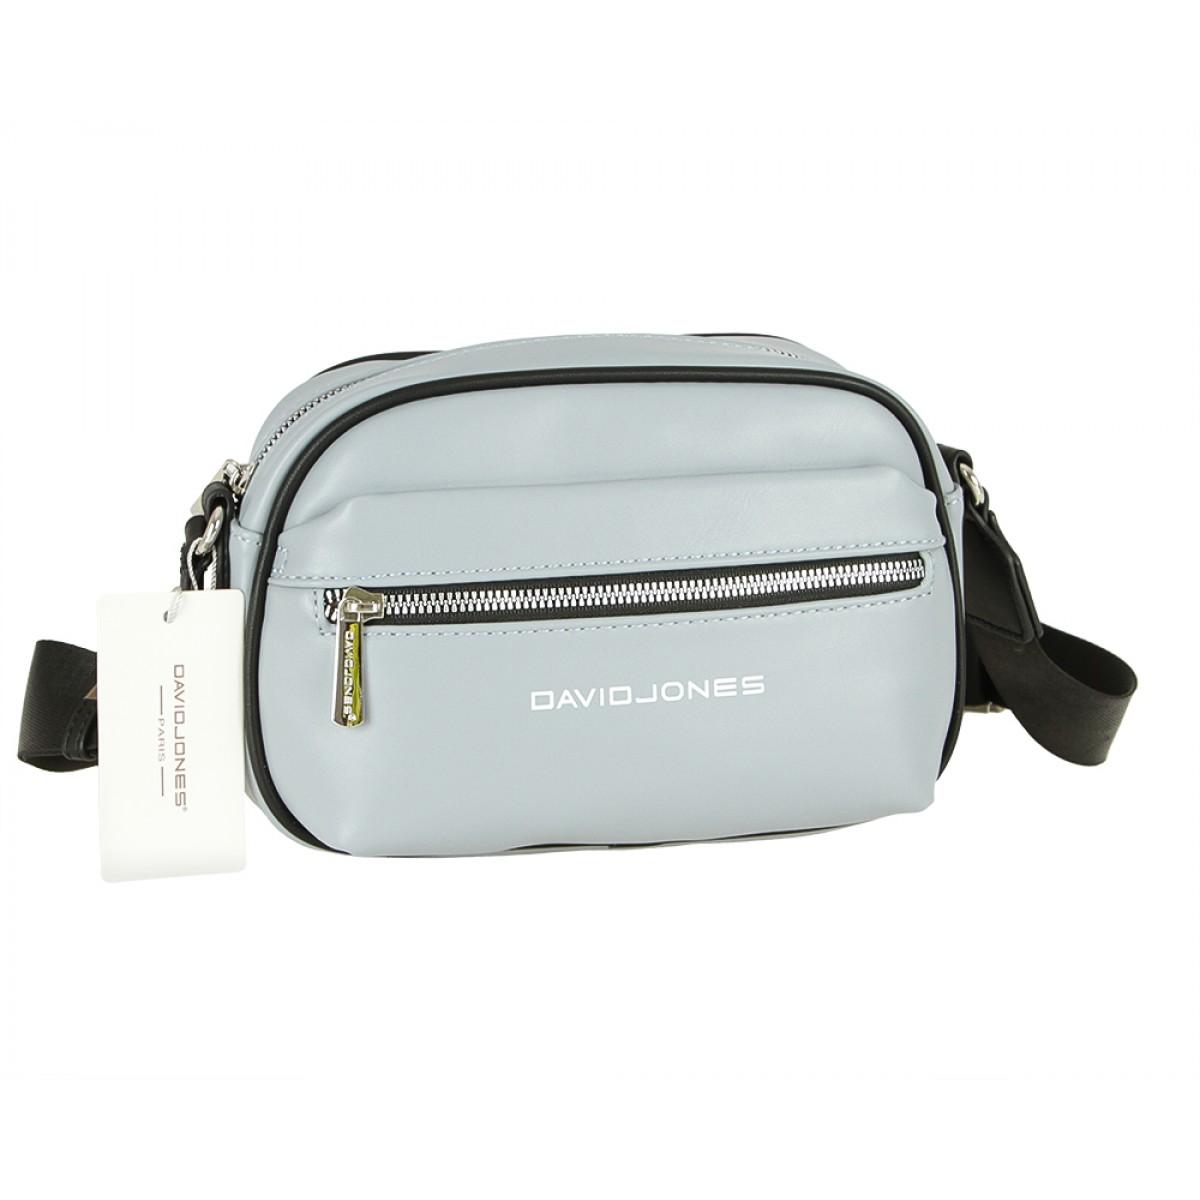 Жіноча сумка David Jones 6208-1 PALE BLUE